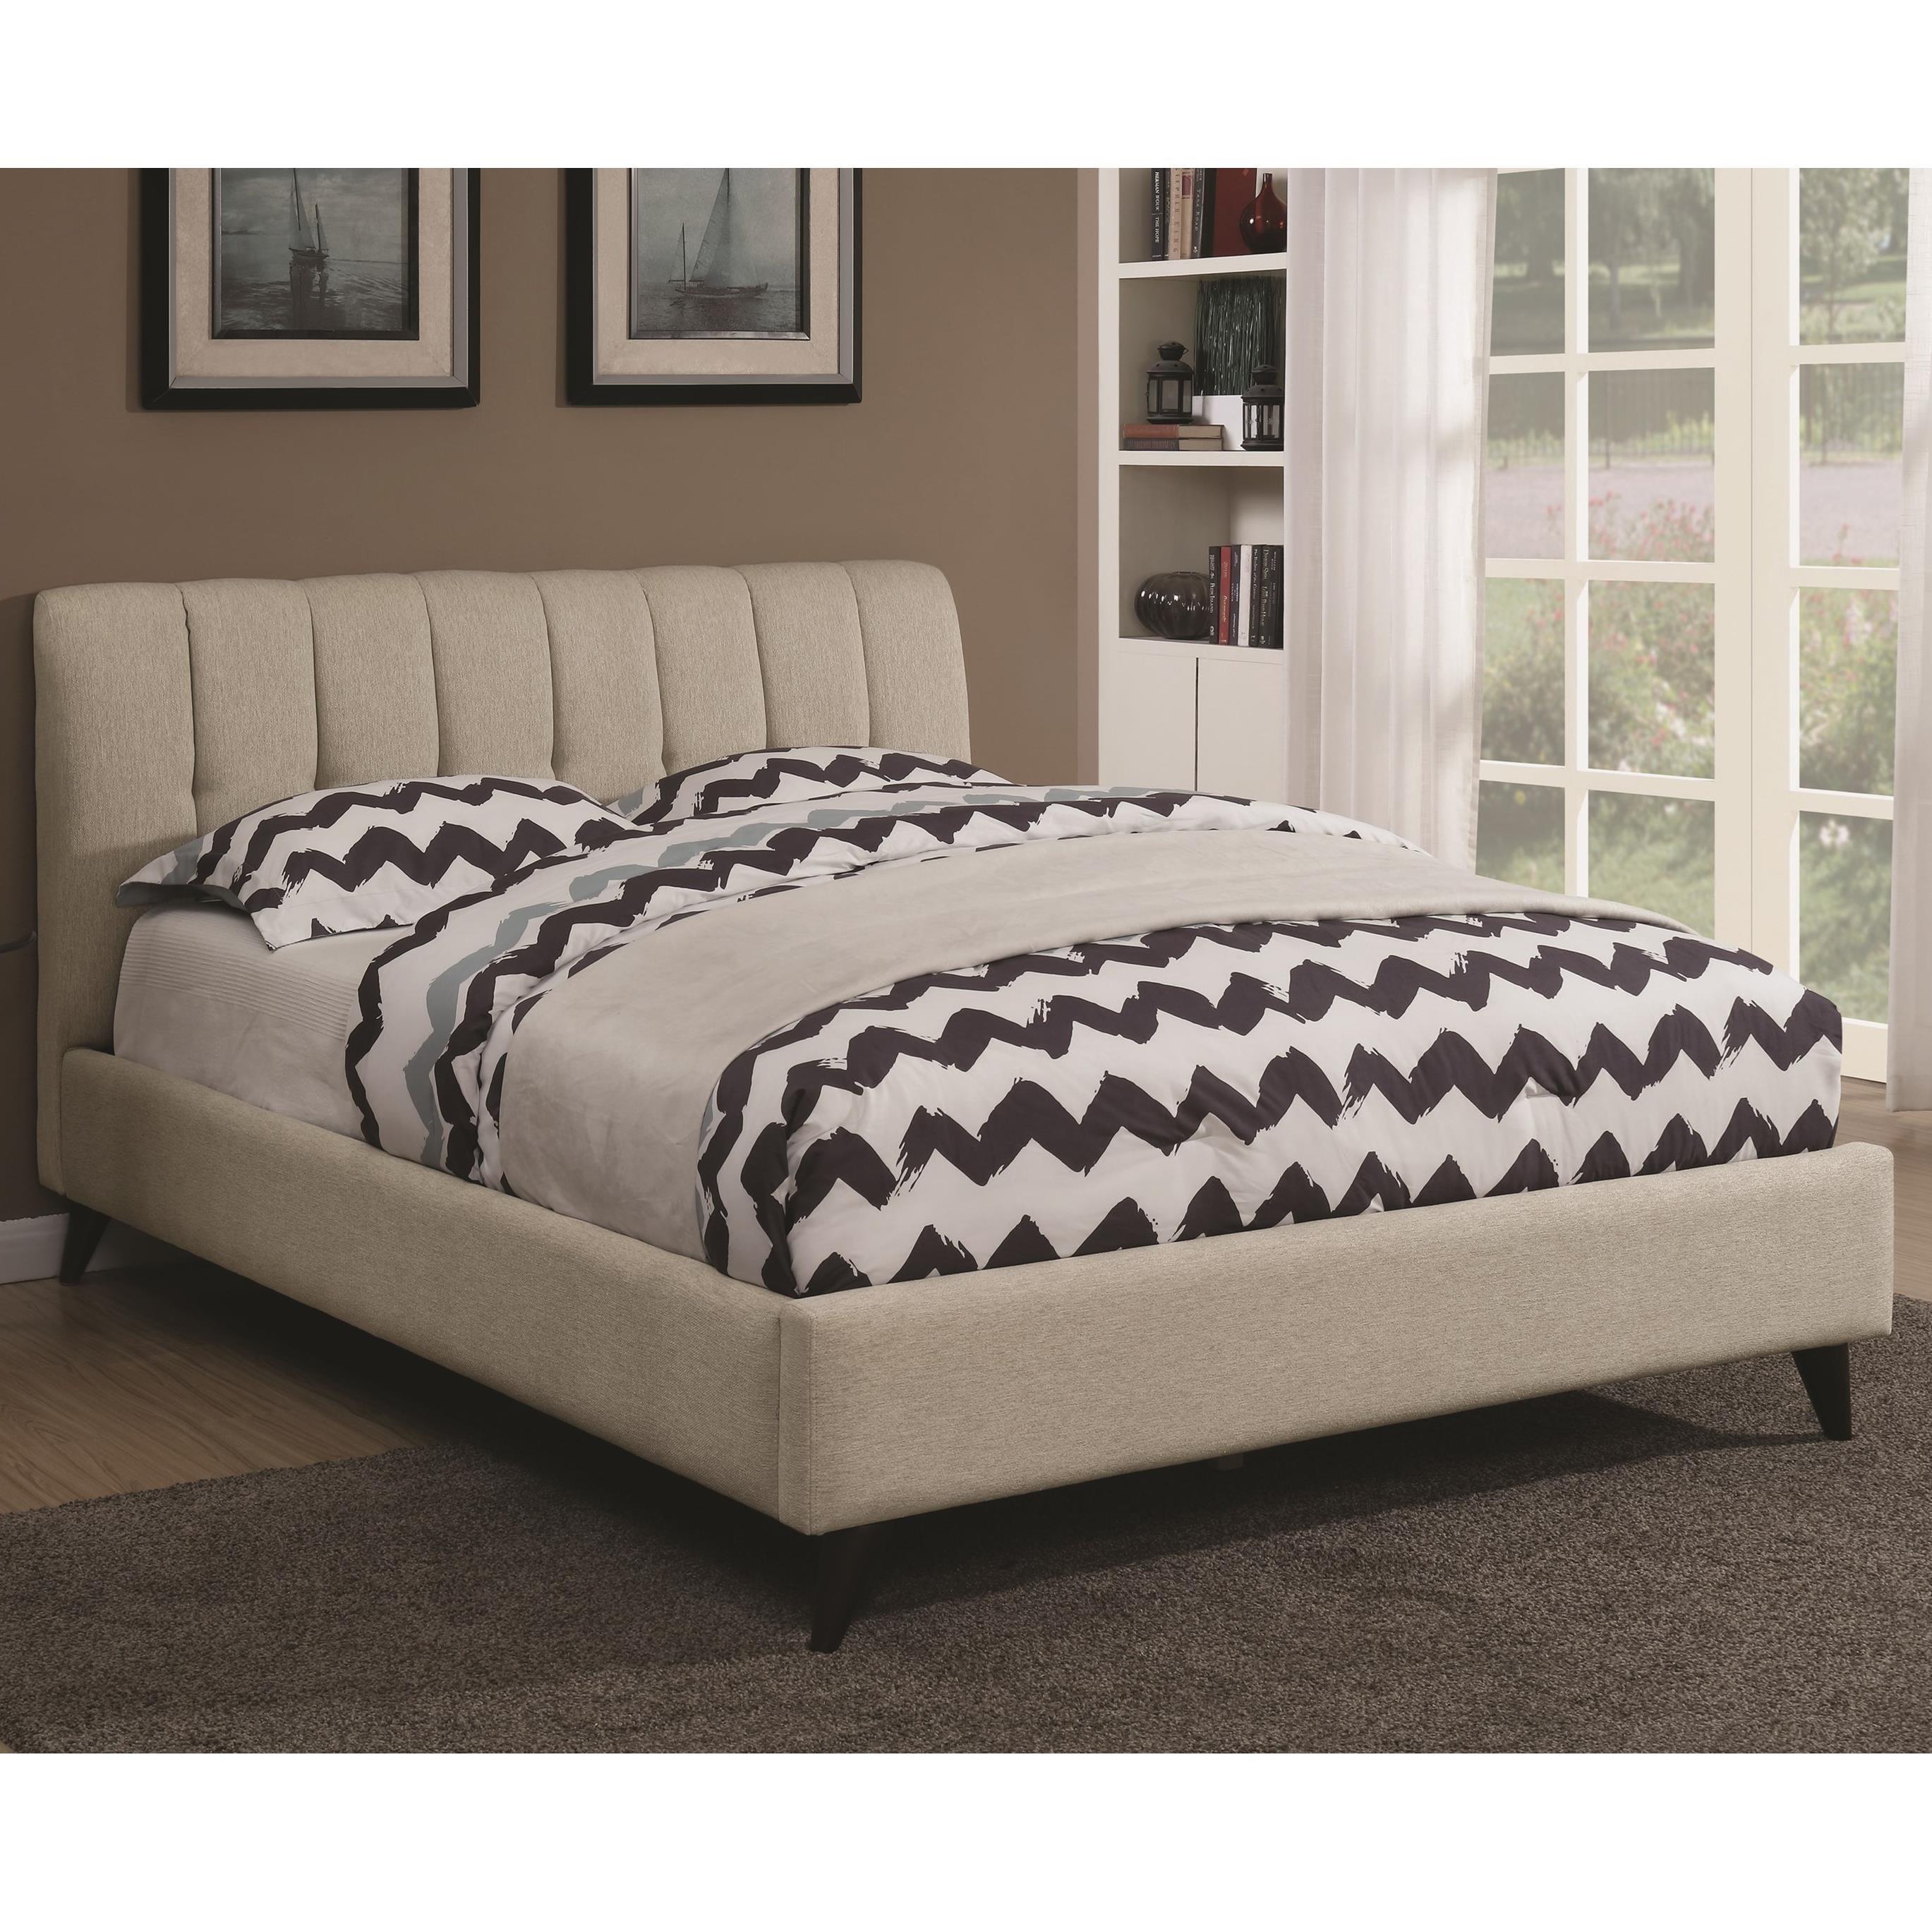 Coaster Portola Mid Century Modern Upholstered Full Bed